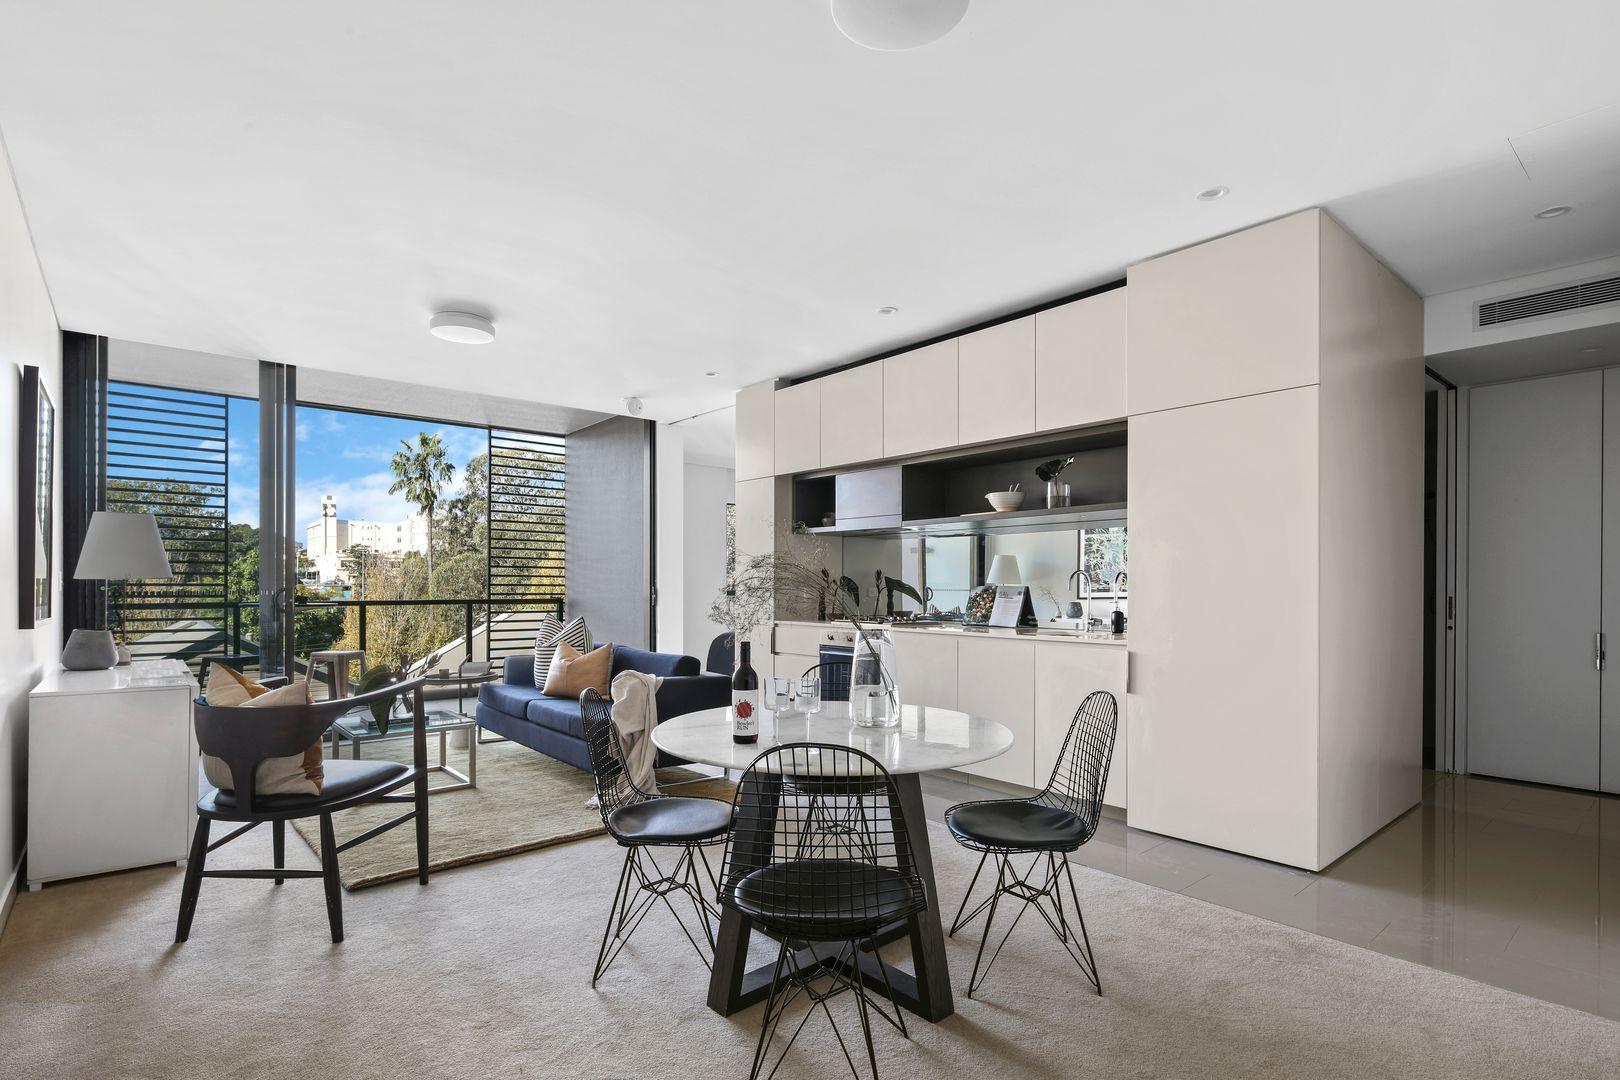 1 bedrooms Apartment / Unit / Flat in 304/12 Denison Street CAMPERDOWN NSW, 2050